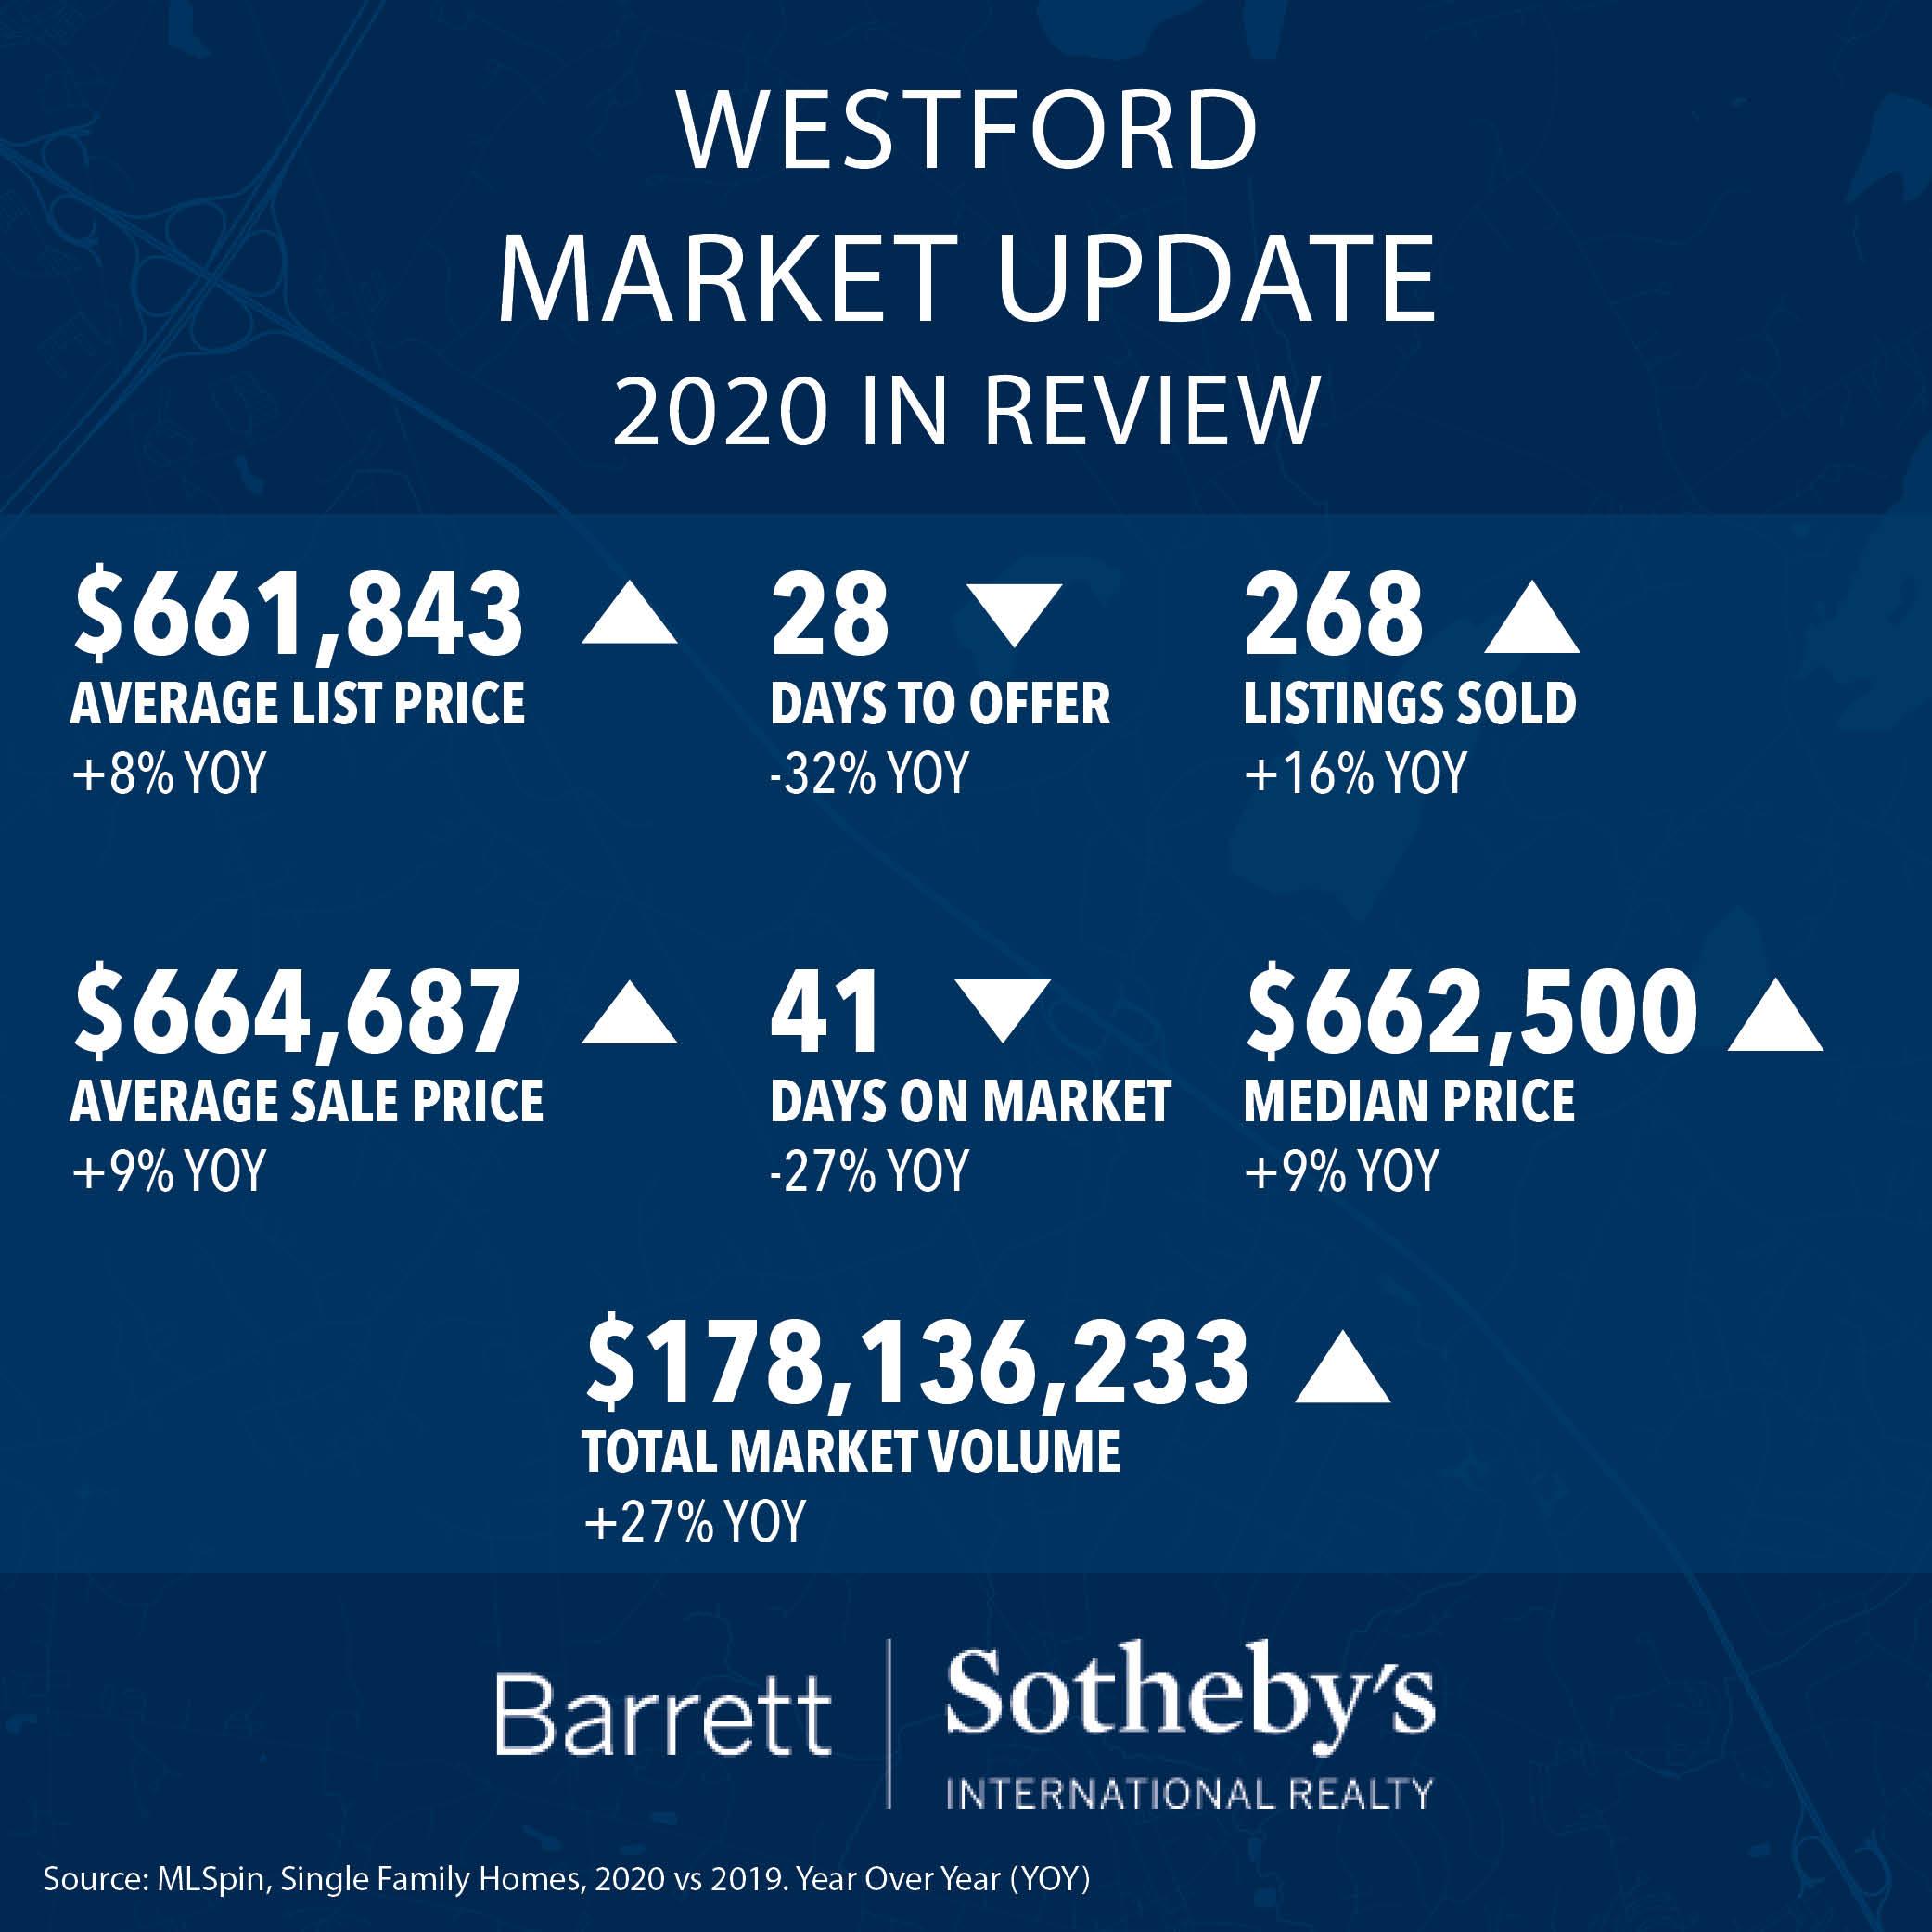 Westford Market Update: 2020 in Review